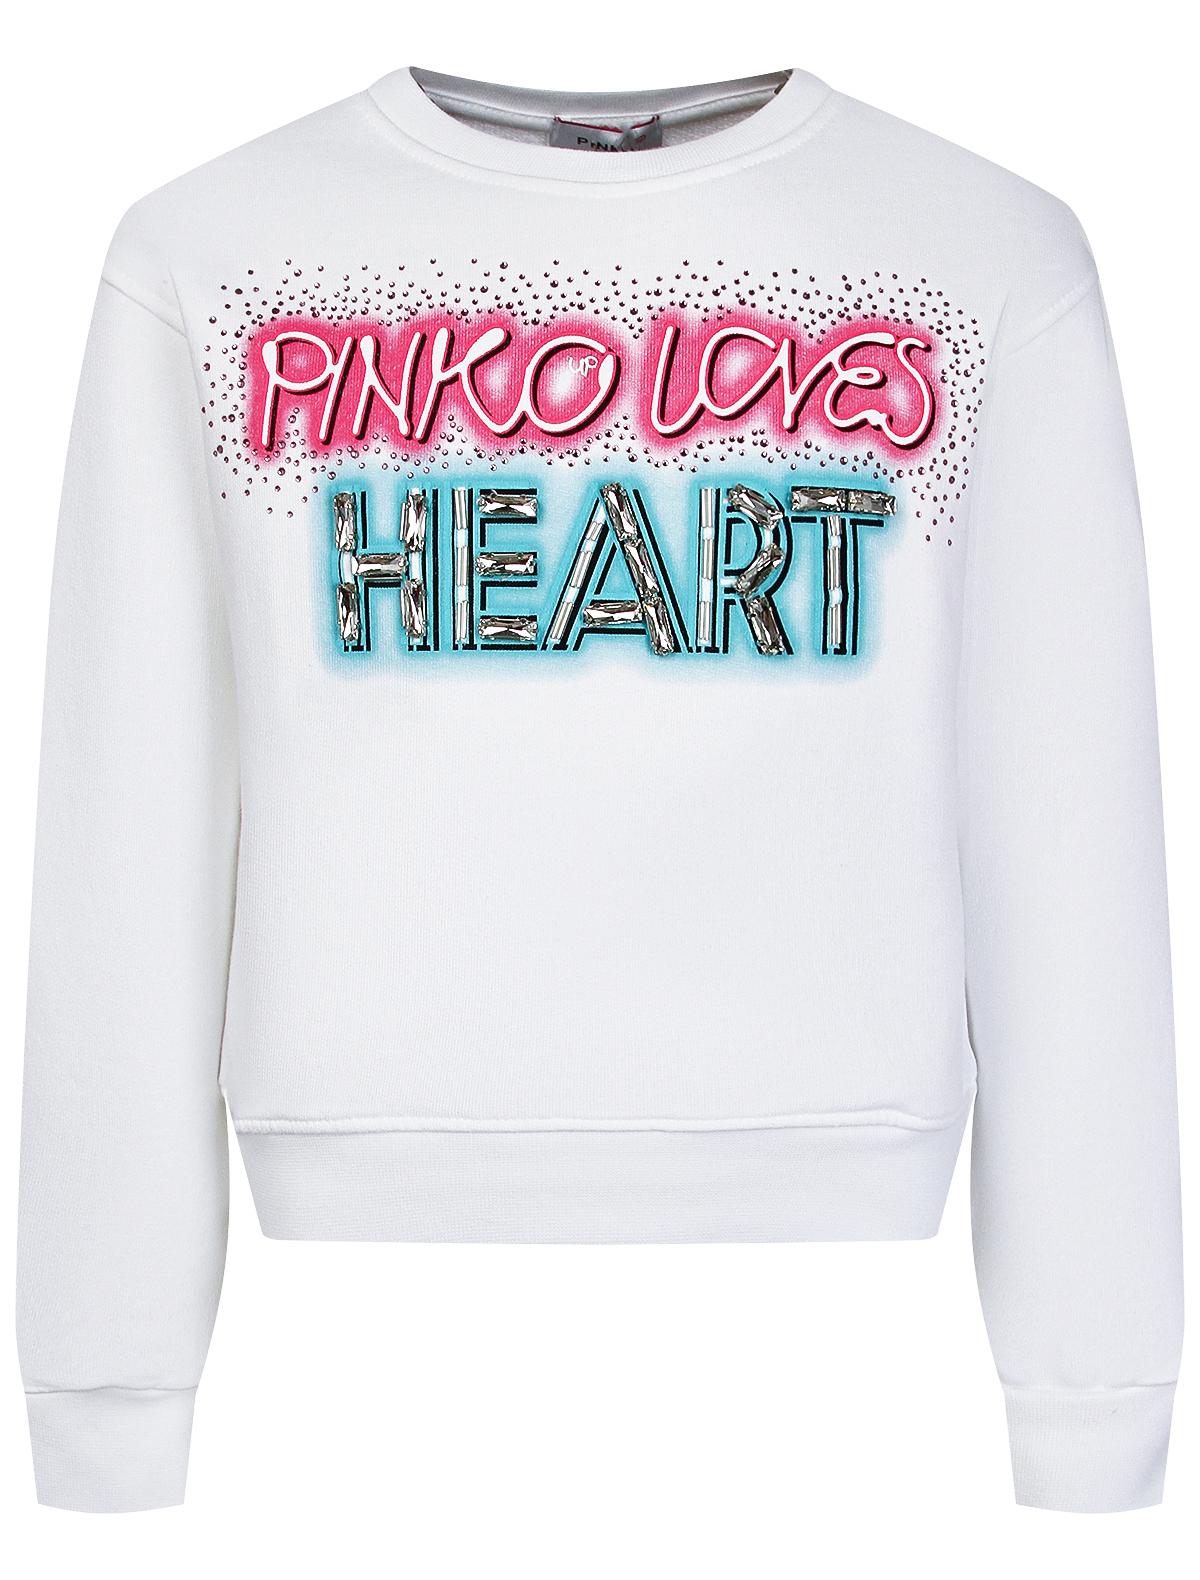 Купить 2275913, Свитшот Pinko Up, белый, Женский, 0084509170891